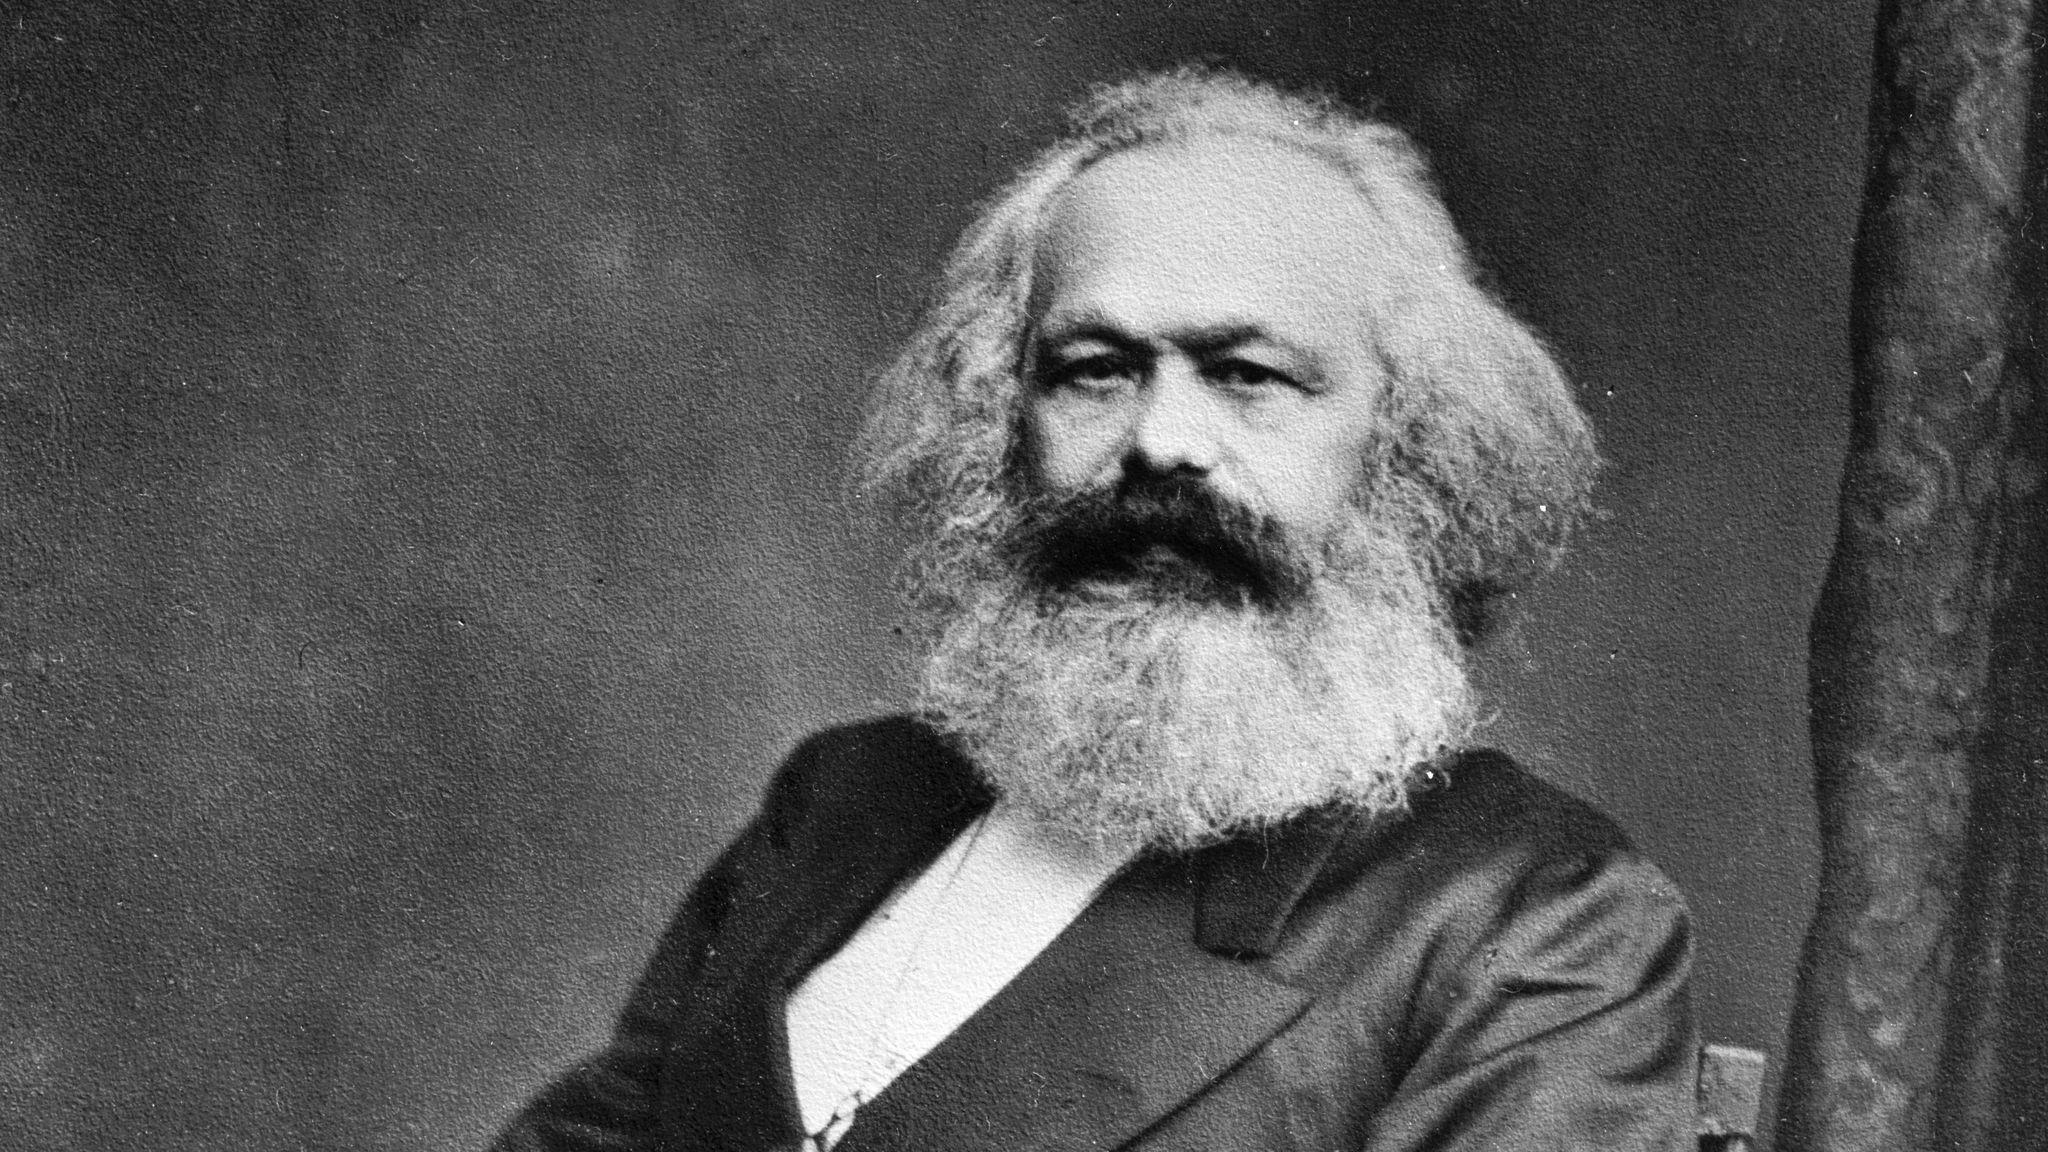 karl marx and the communist manifesto essay 91 121 113 106 karl marx and the communist manifesto essay